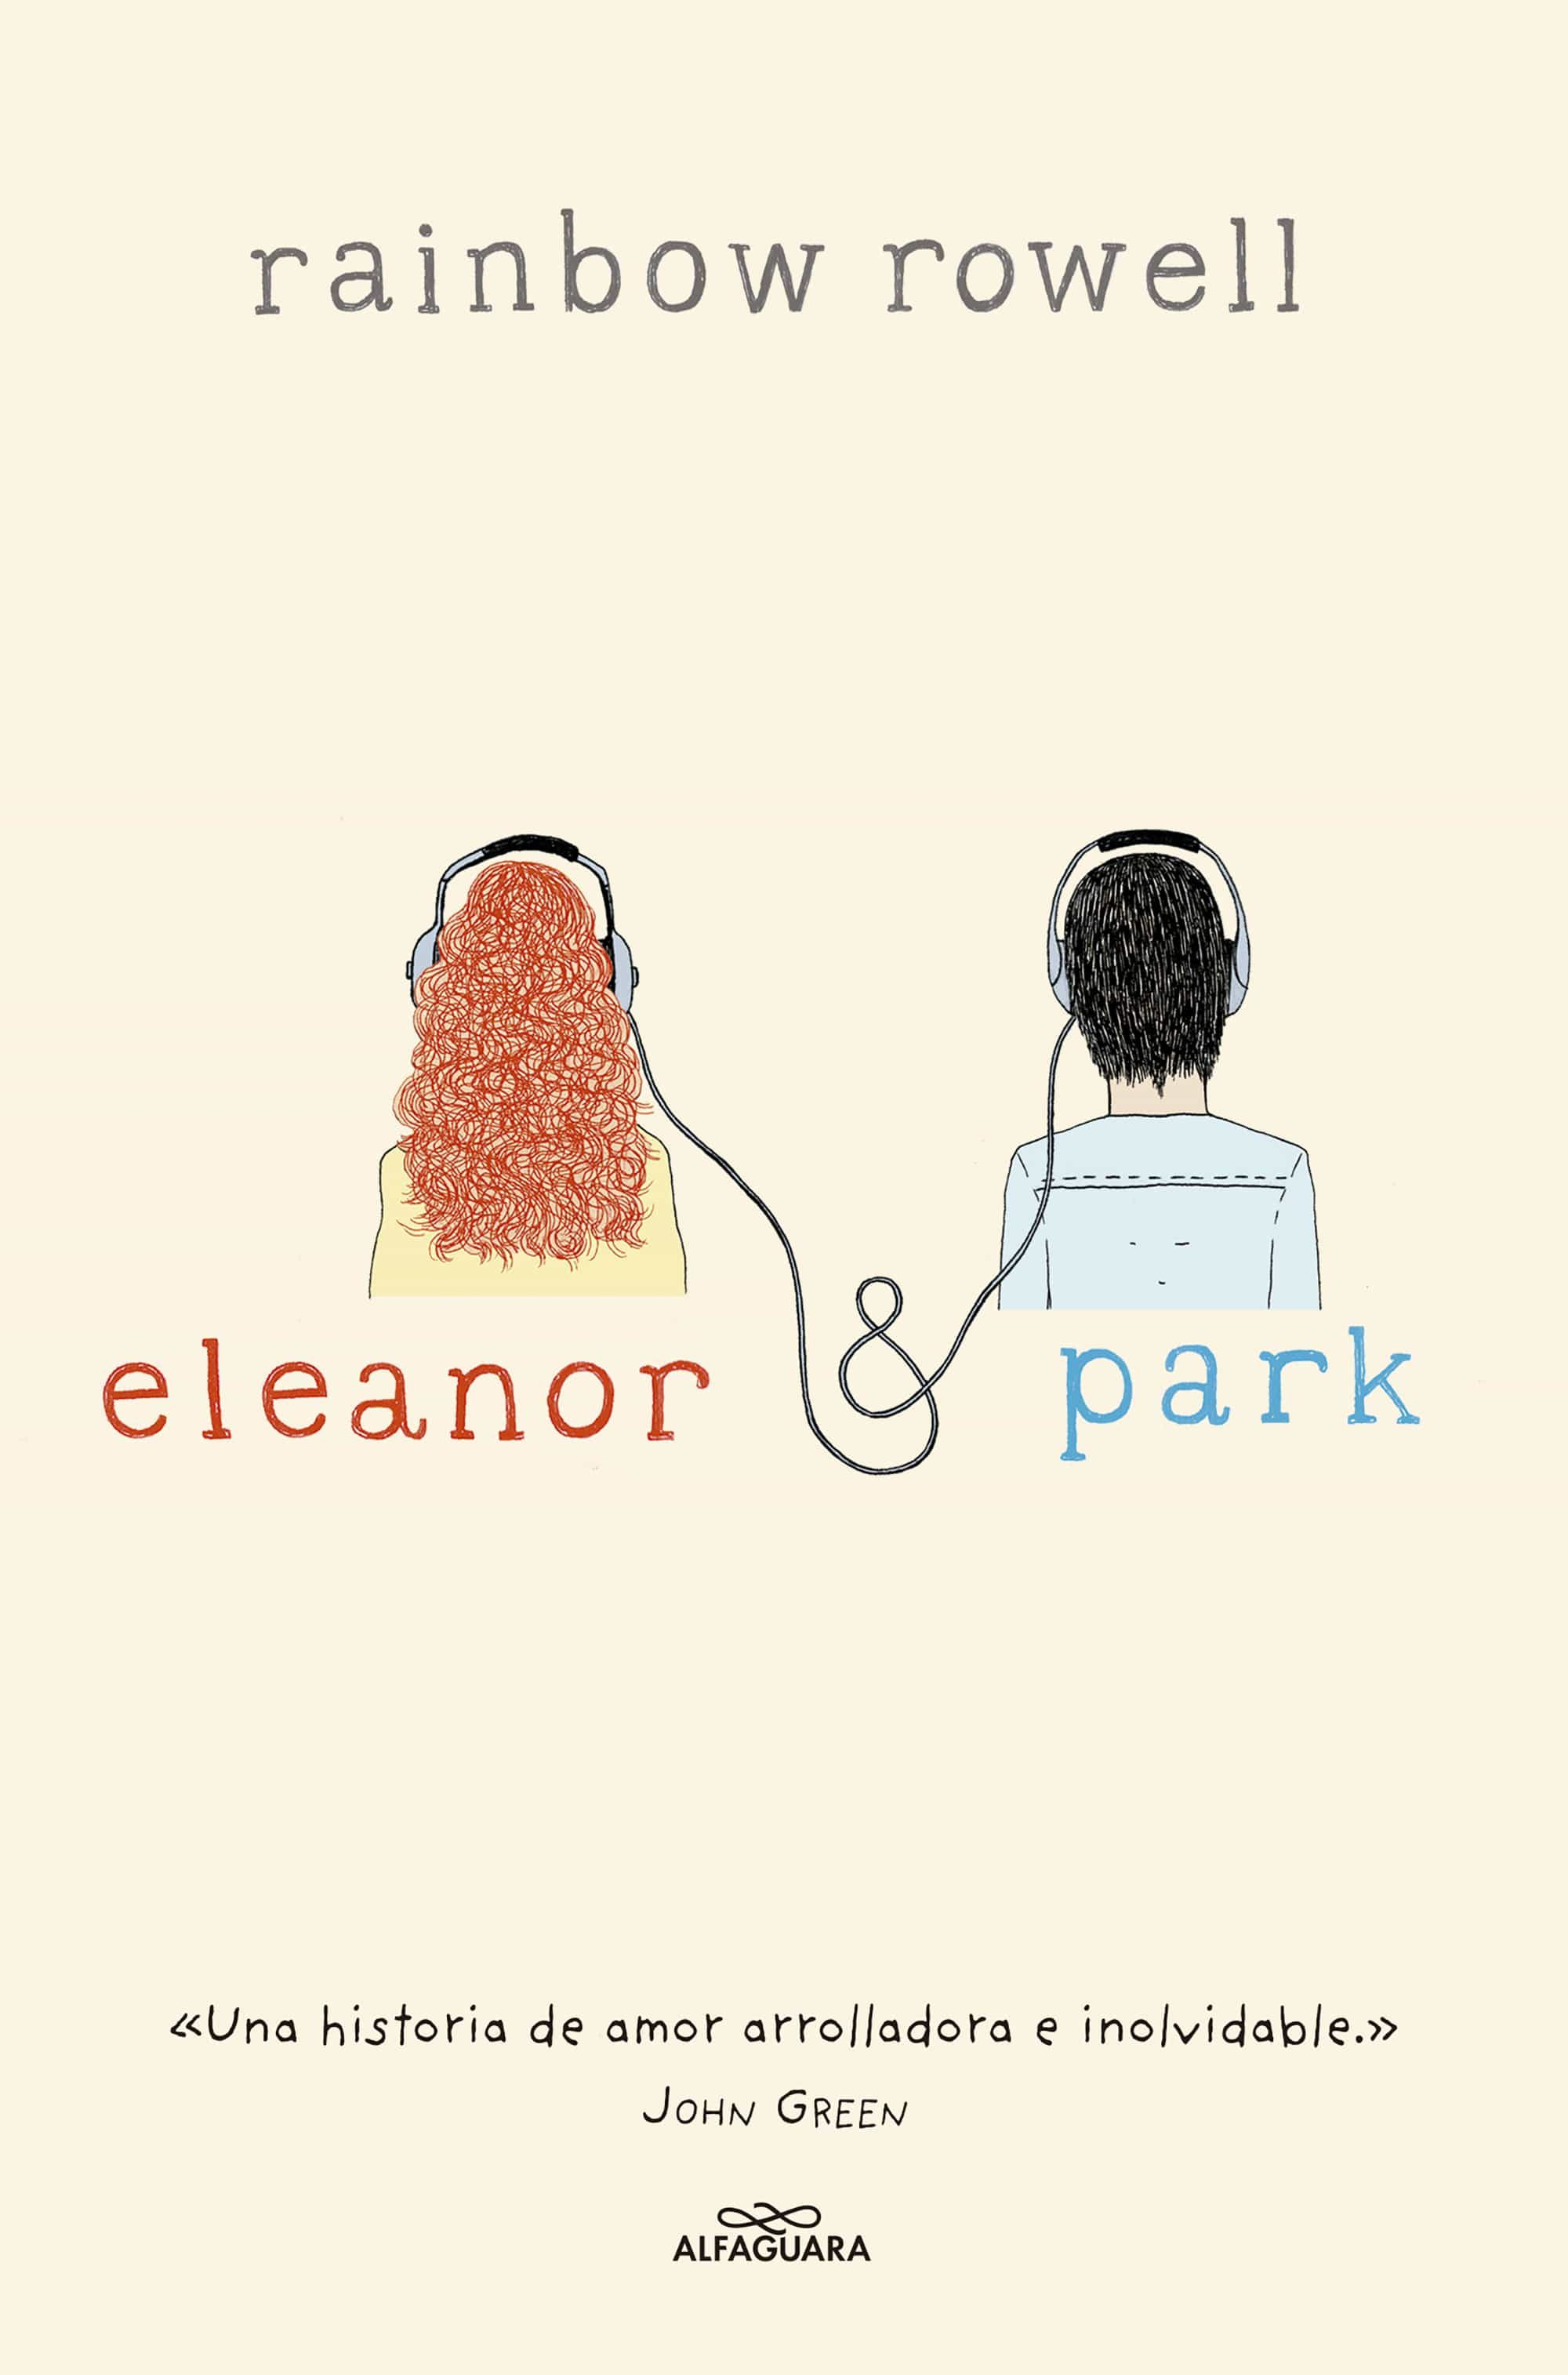 eleanor y park-rainbow rowell-9788420415703